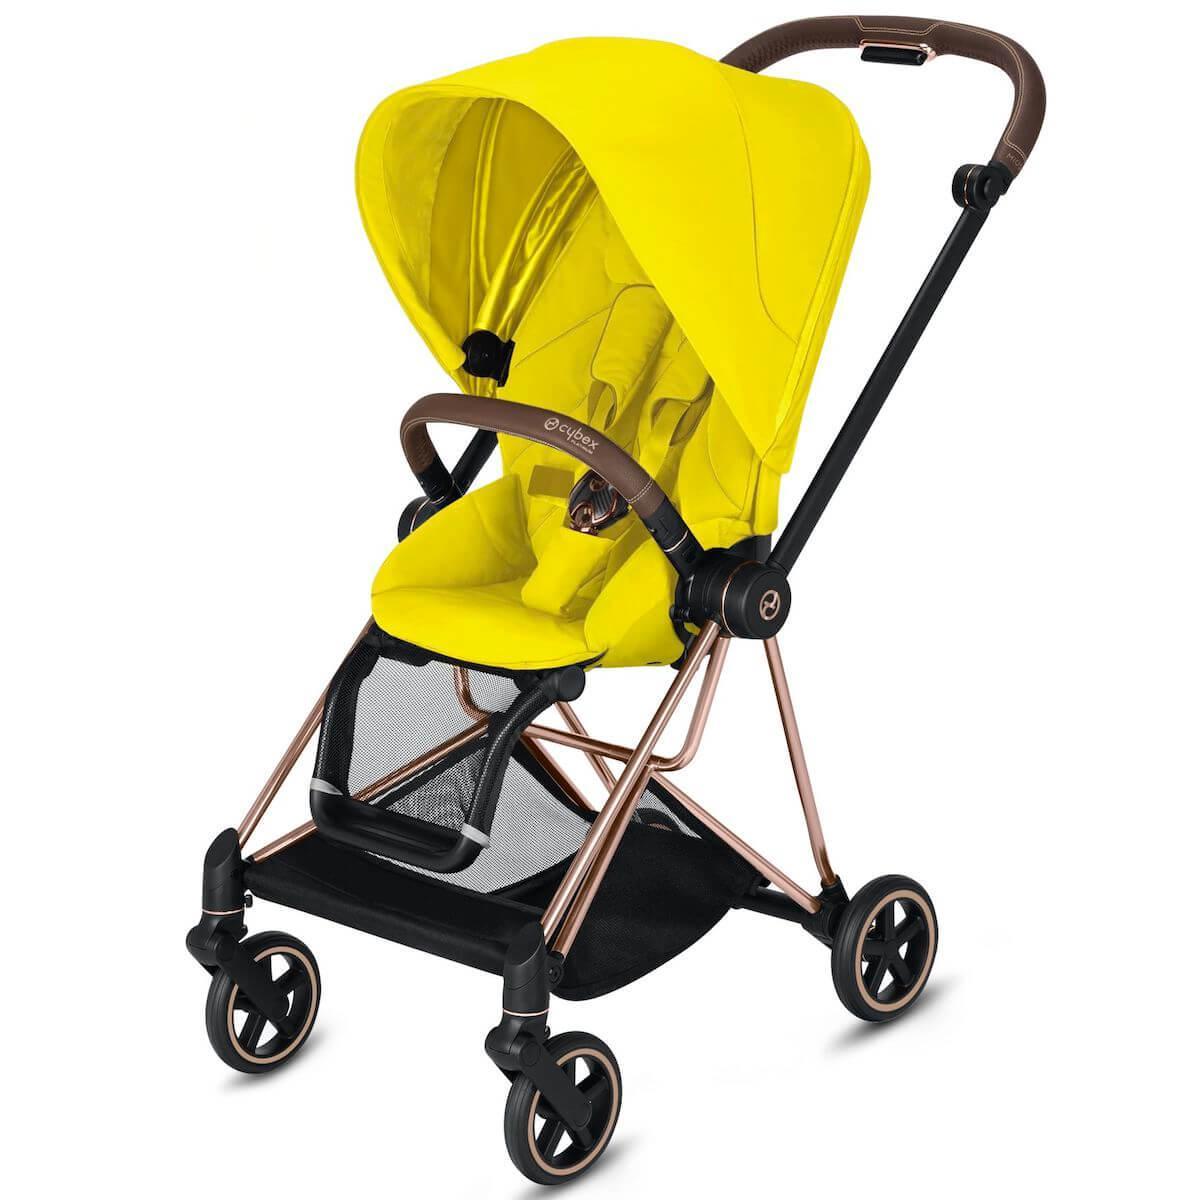 Asiento-pack silla MIOS Cybex Mustard yellow-yellow